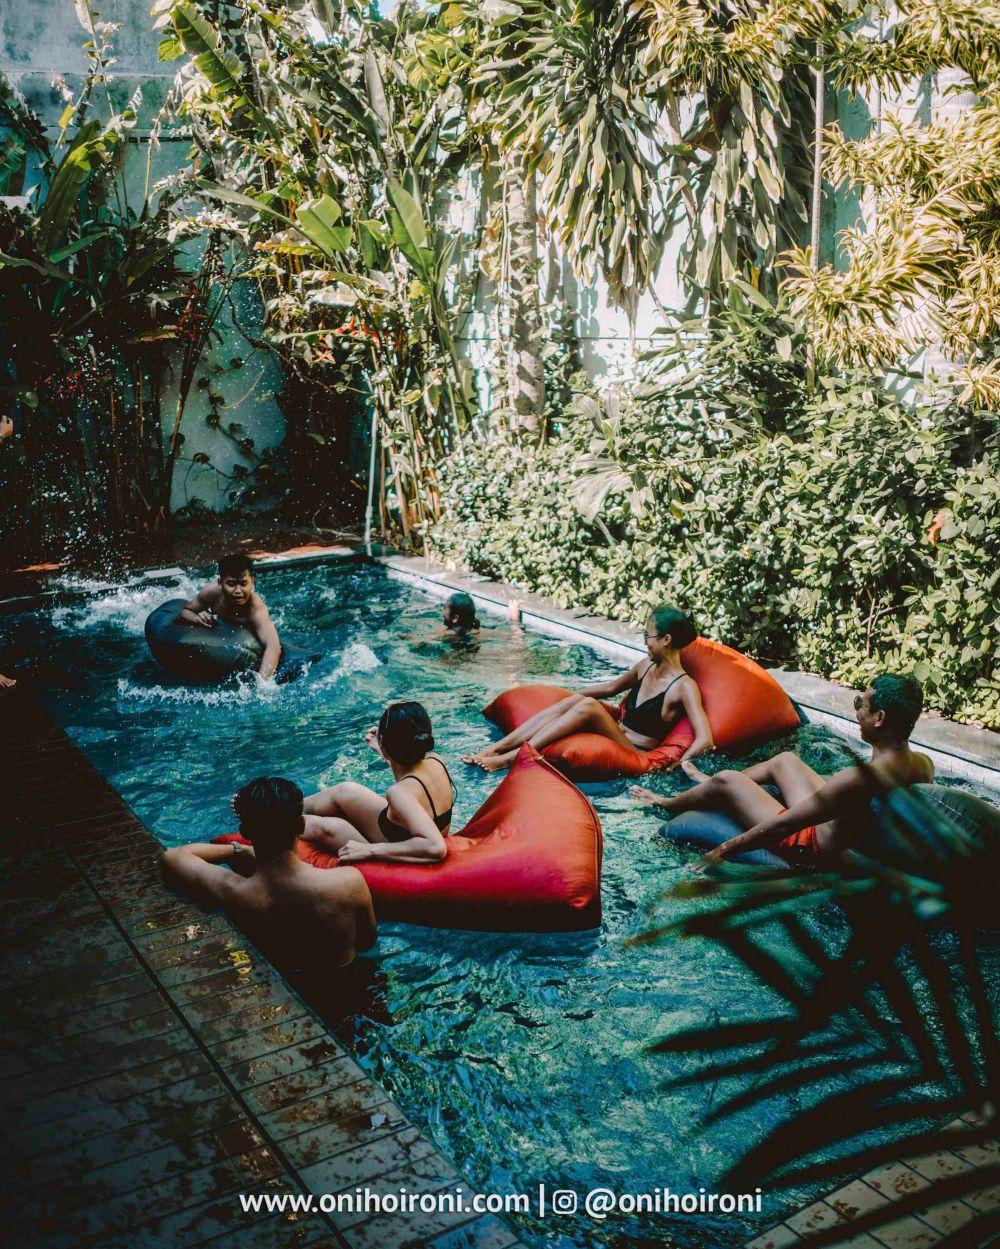 1 0rekomendasi villa yang terdekat dengan la favela chalet by sabda oni hoironi.jpg